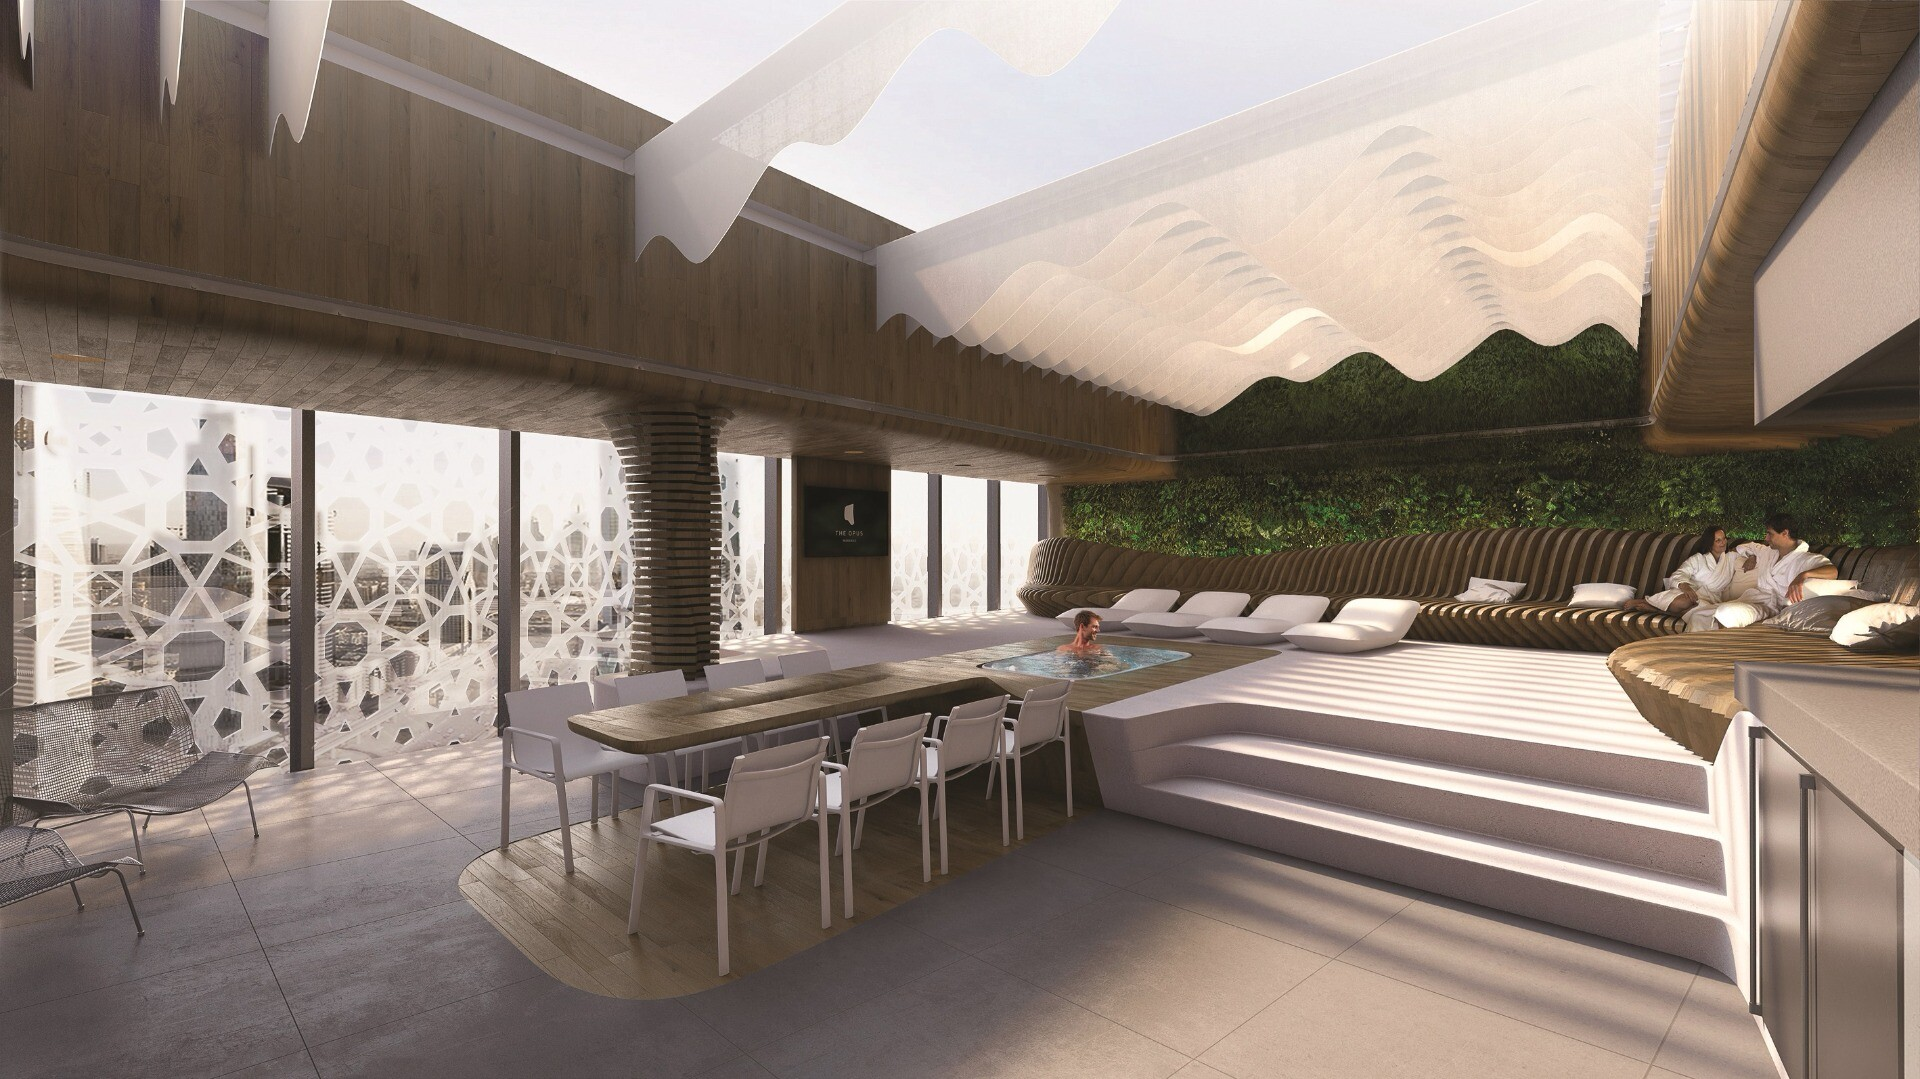 A common area inside the Opus building, by Zaha Hadid